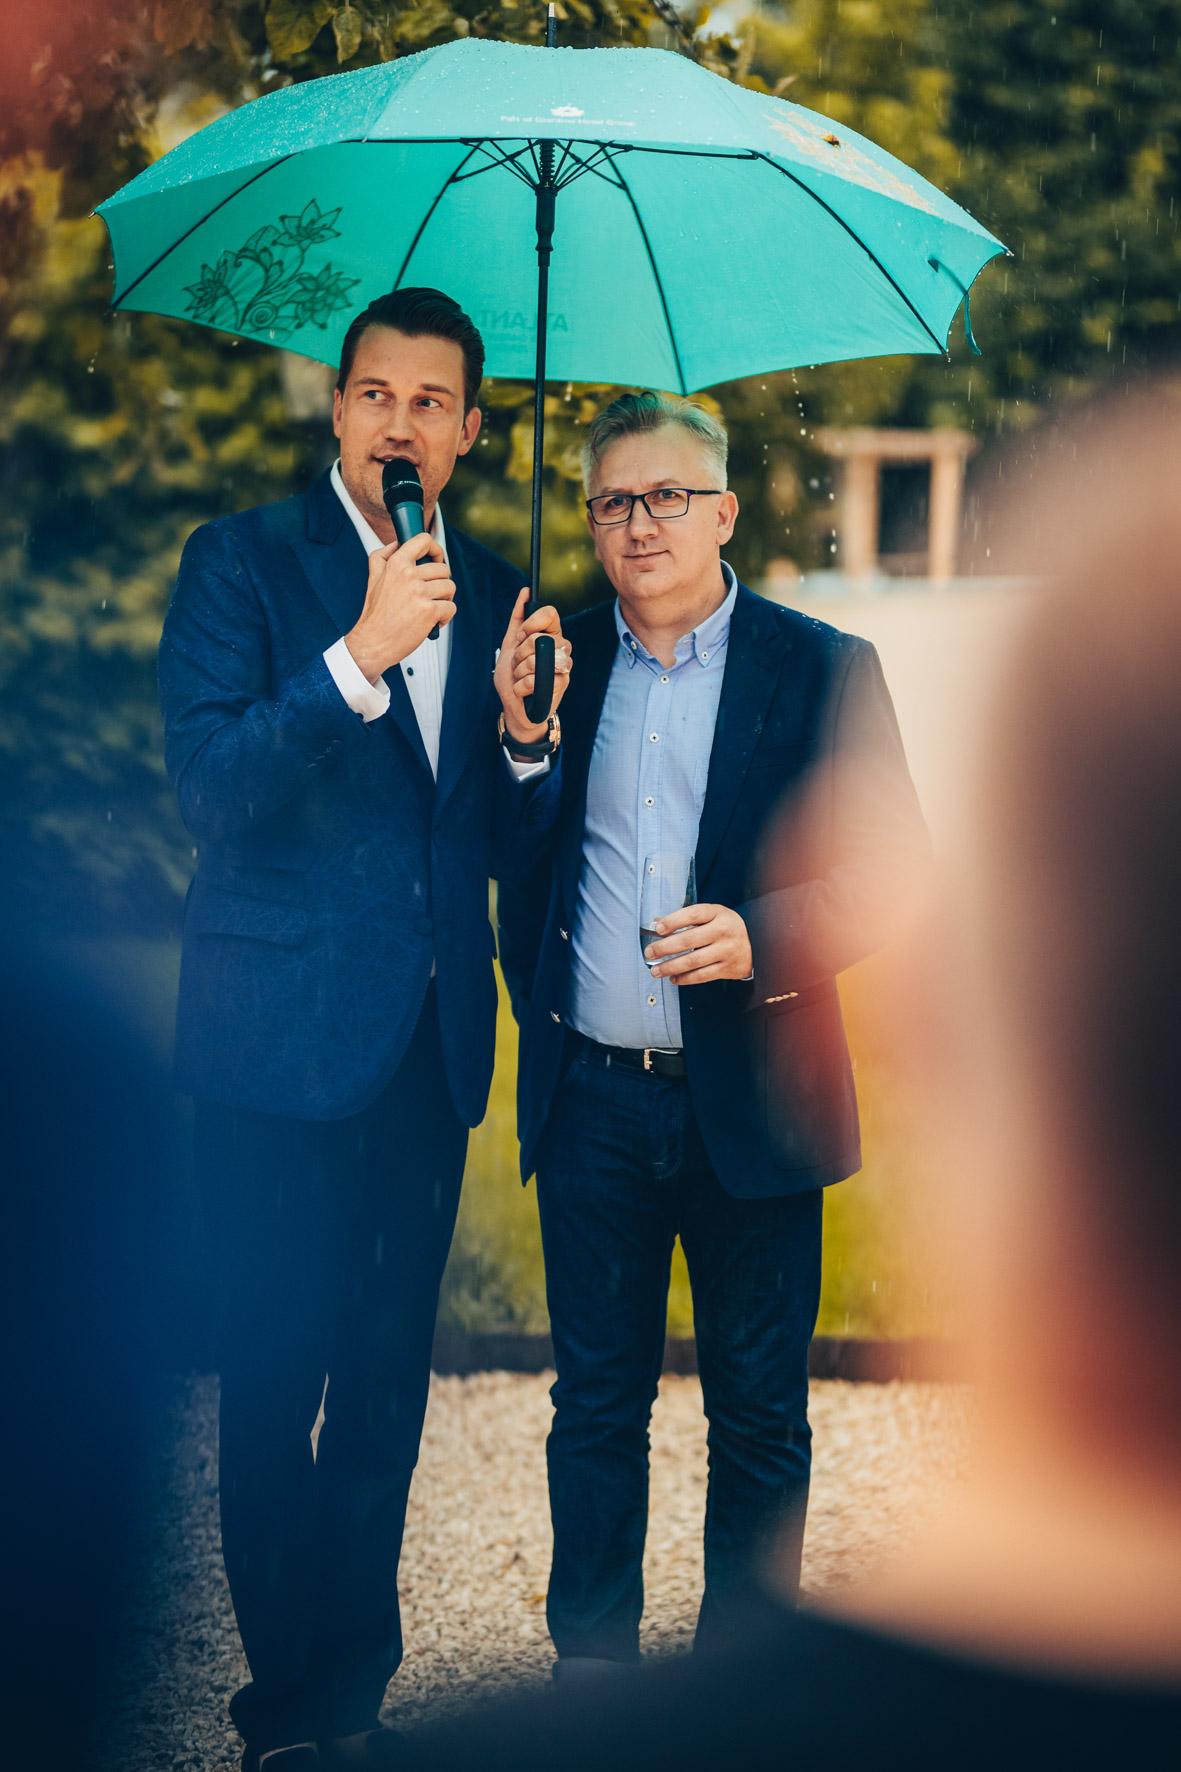 Konrad-lifestyle-art-basel-%22grand-party%22-2019-28.jpg